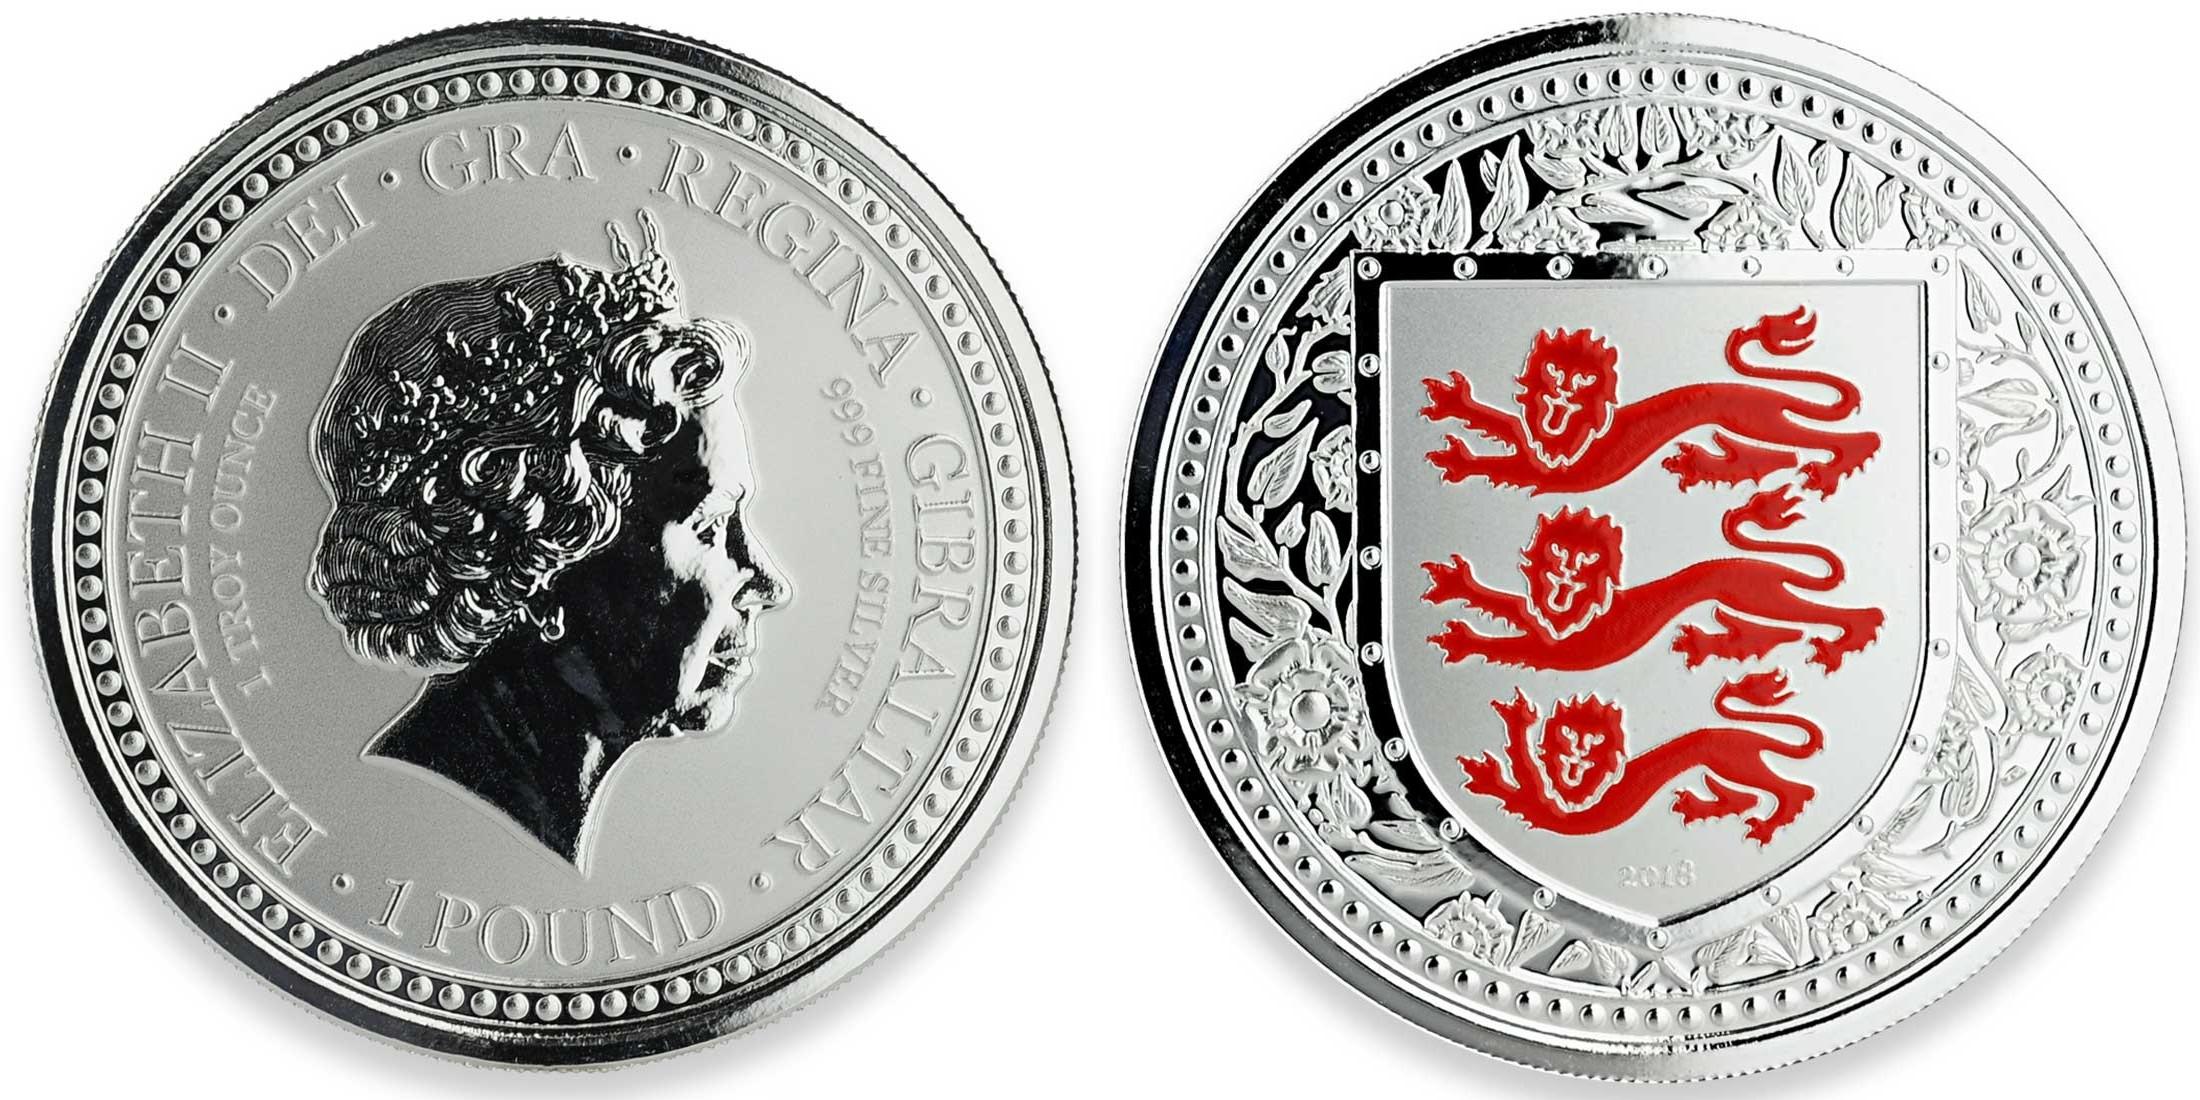 gibraltar 2018 armes royales d'angleterre rouge